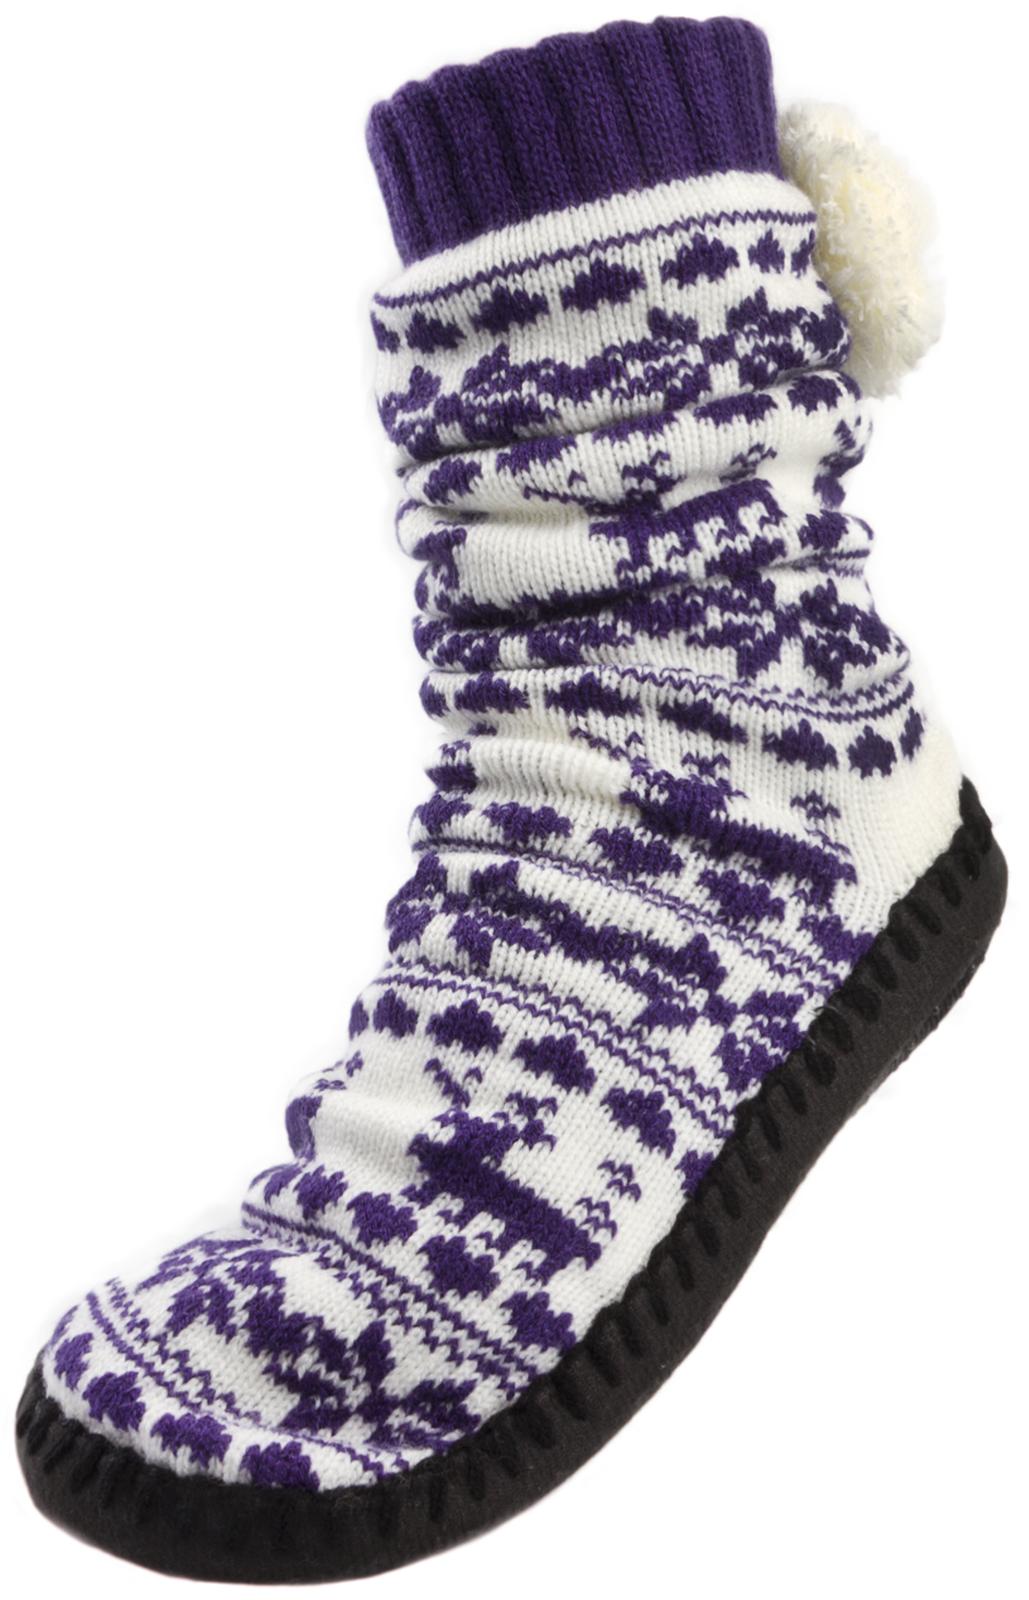 Womens Ladies Girls Reindeer Knitted Boots Slipper Socks Ankle Booties Size 4-7 | EBay